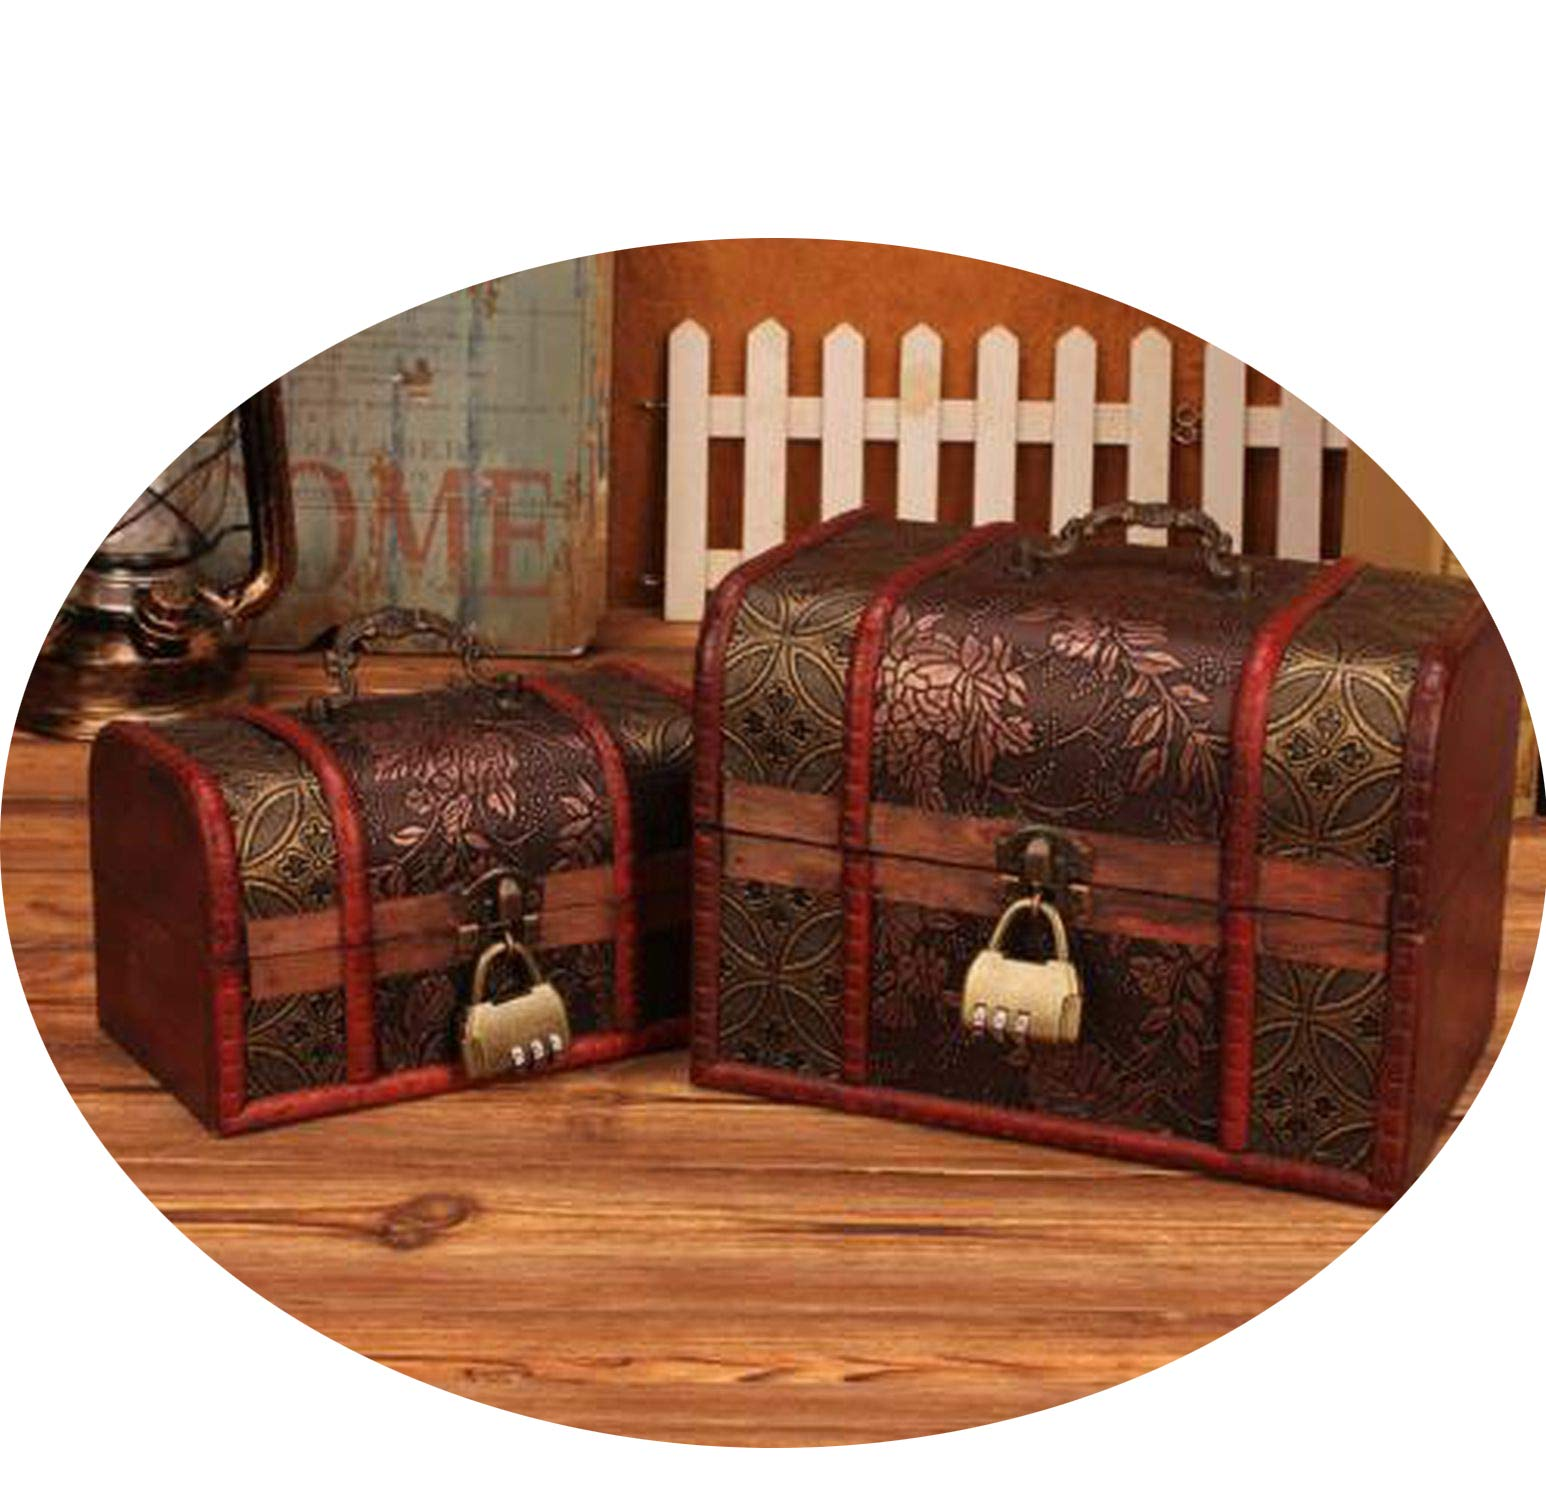 Vintage storage box desktop wool jewelry box with lock decoration box Wedding gifts,with lock